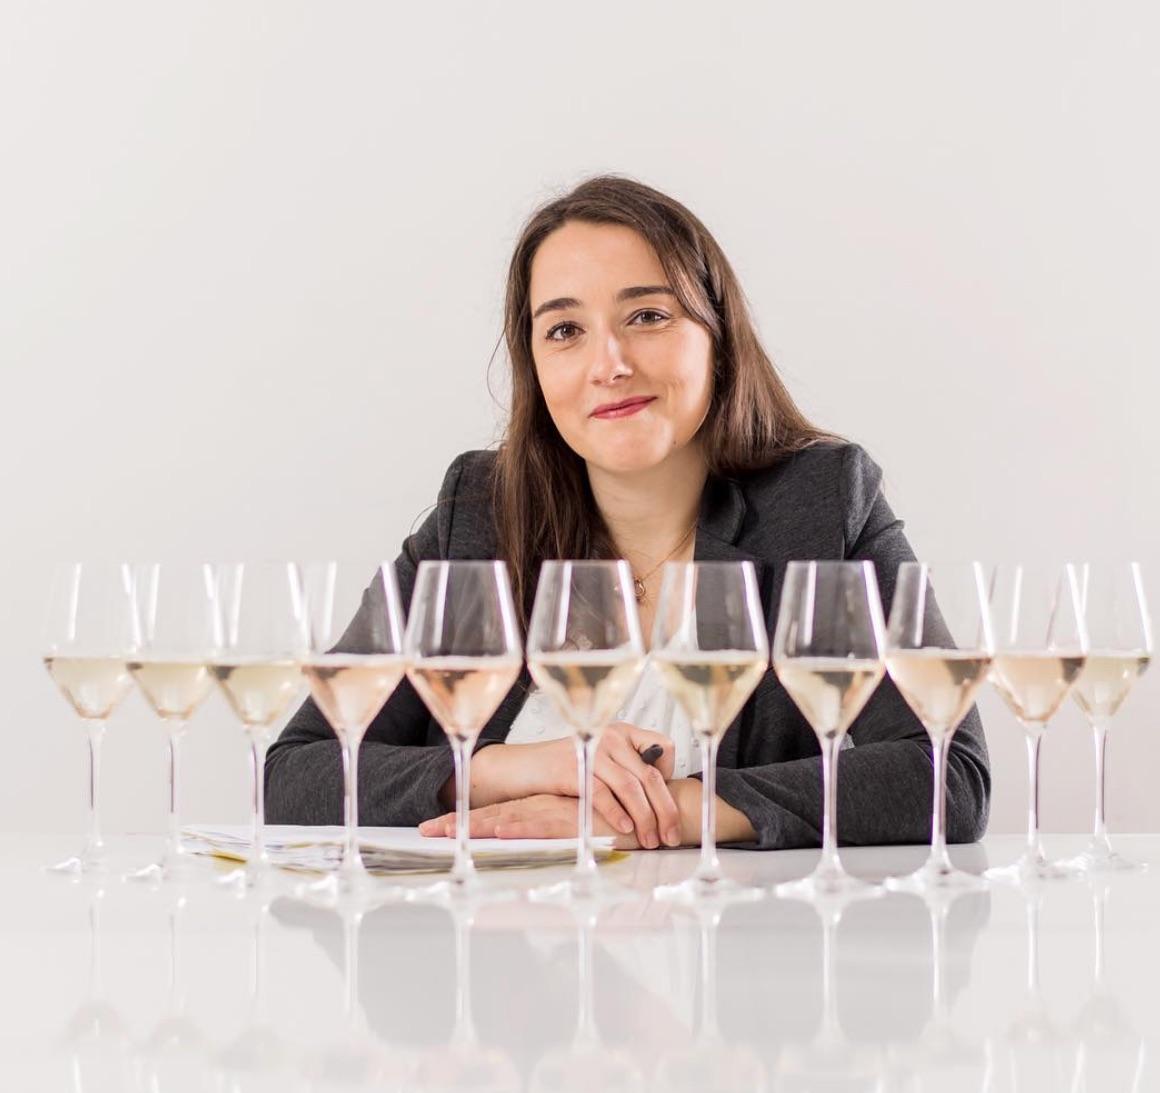 Pauline Lhote blends sparkling wine